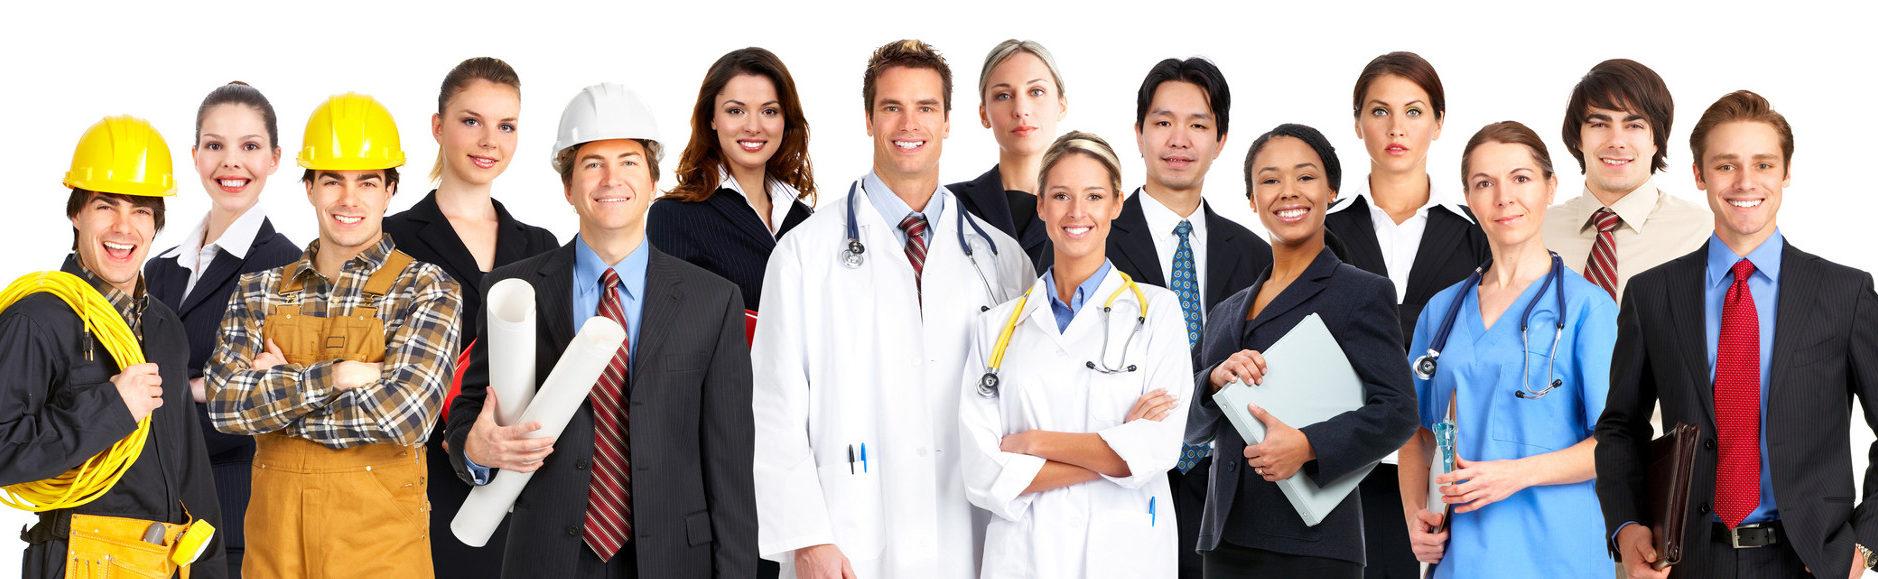 Plano de Saúde MEI